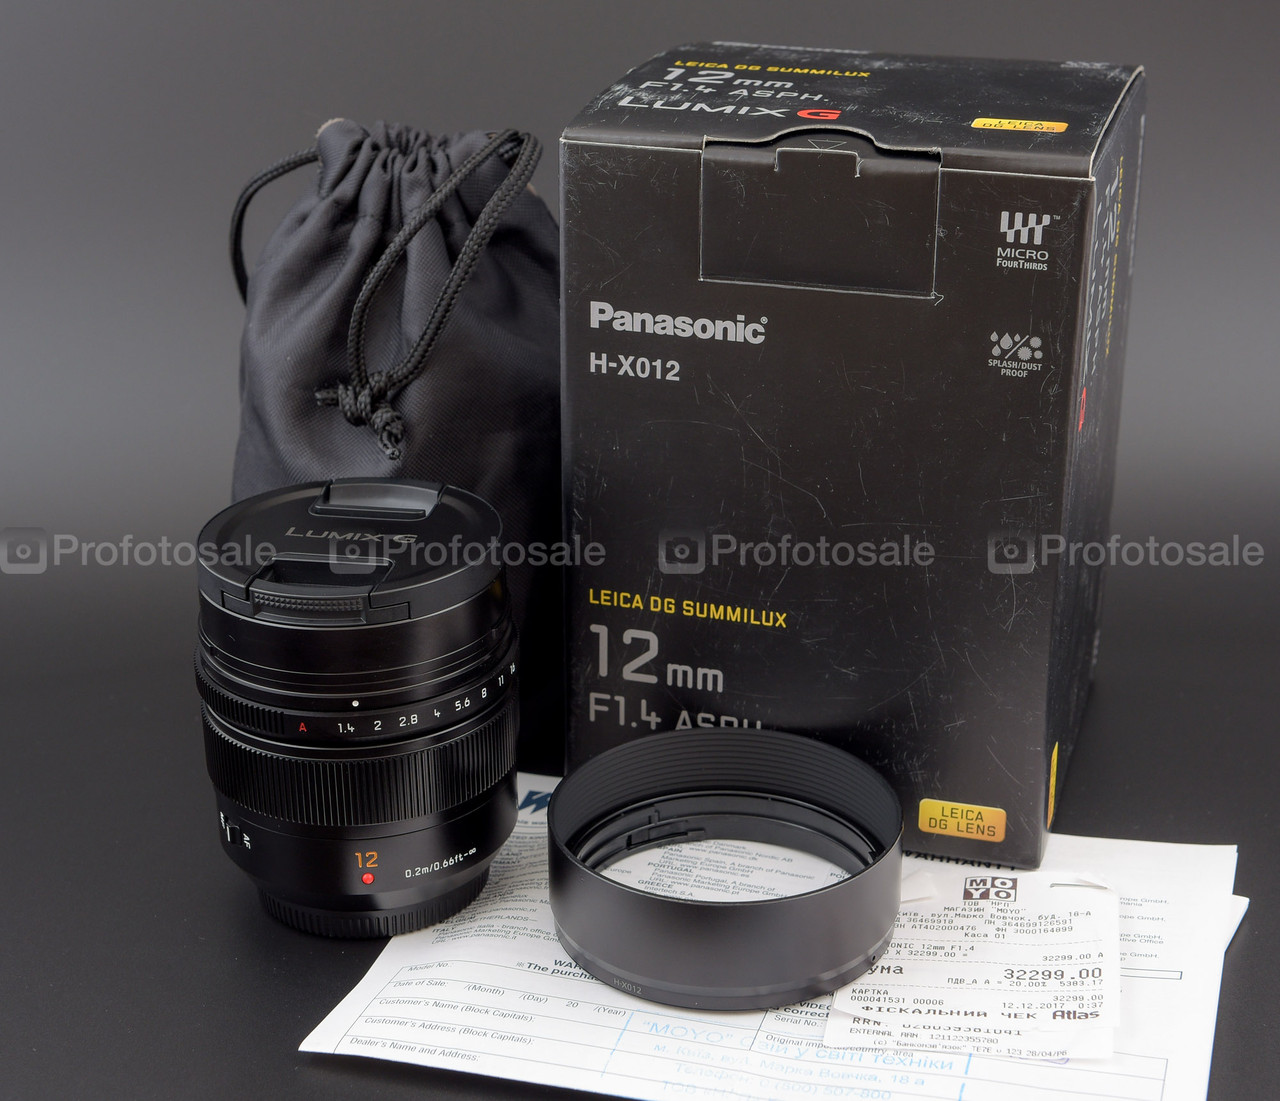 Panasonic Leica DG Summilux 12mm f/1.4 ASPH. (H-X012)